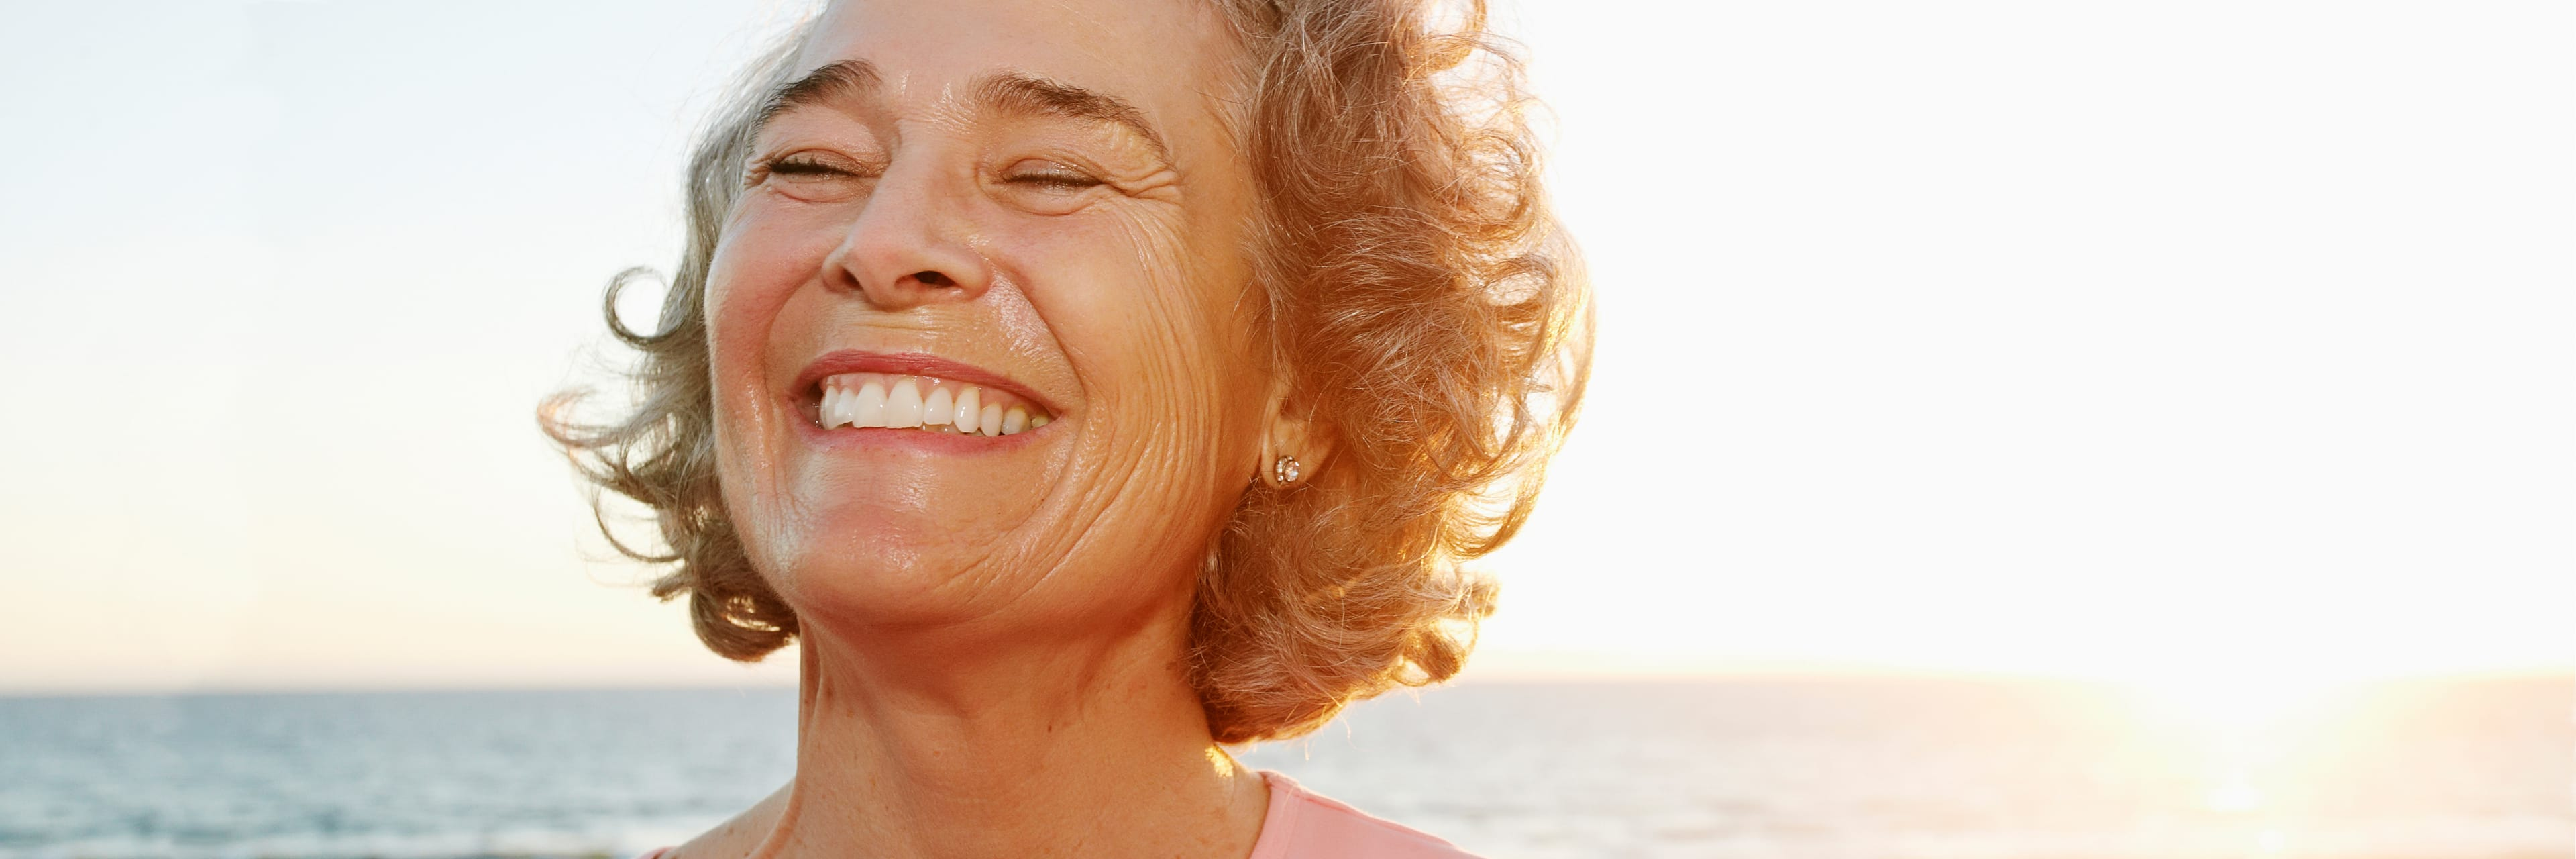 close up of woman smiling at beach